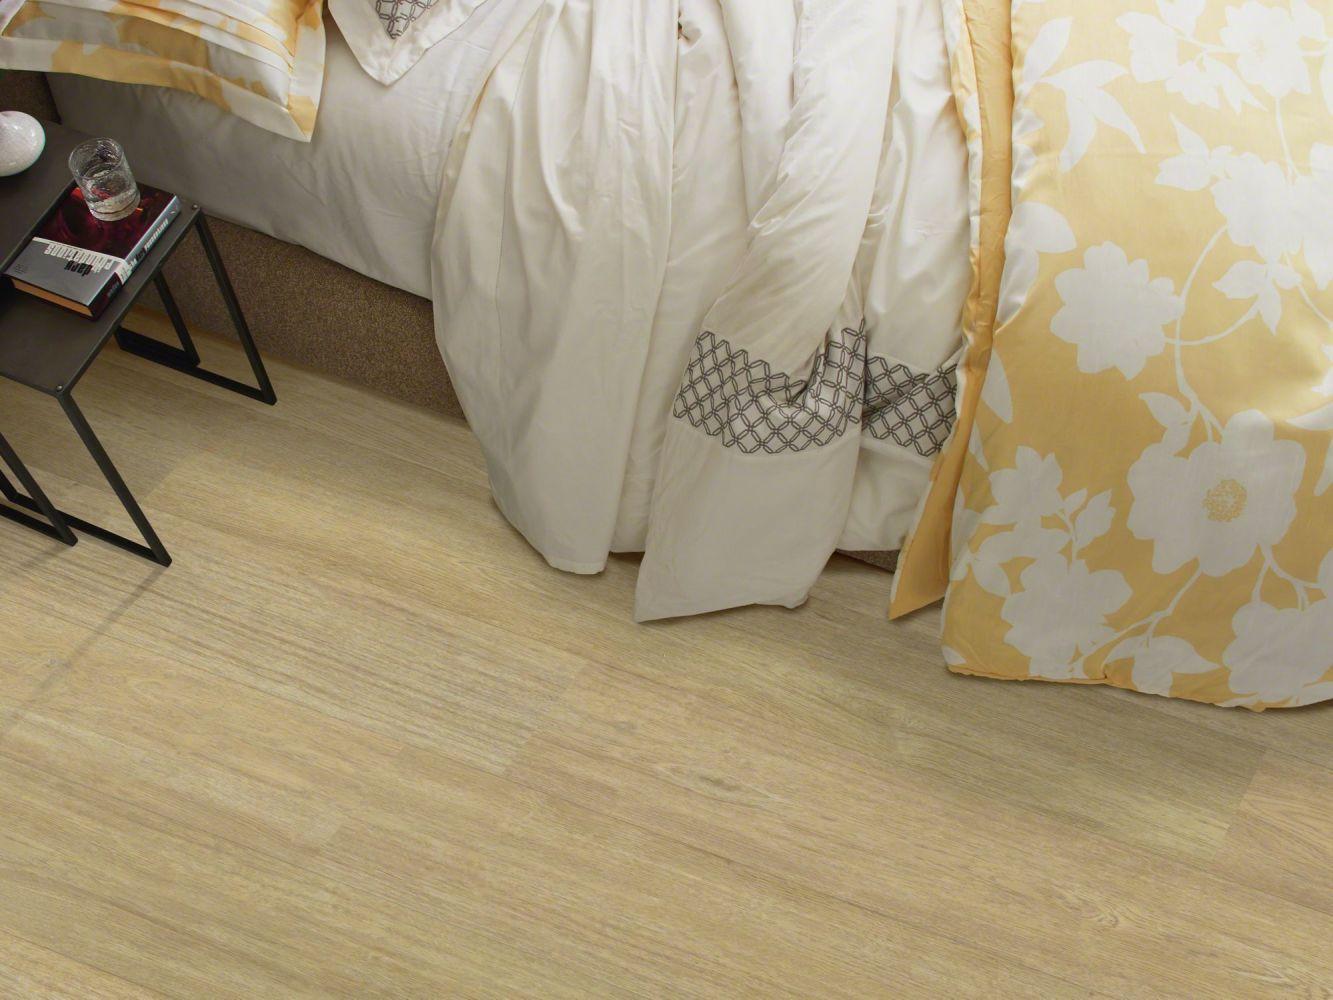 Shaw Floors Resilient Residential Alto Plus Plank Cervati 00205_2576V